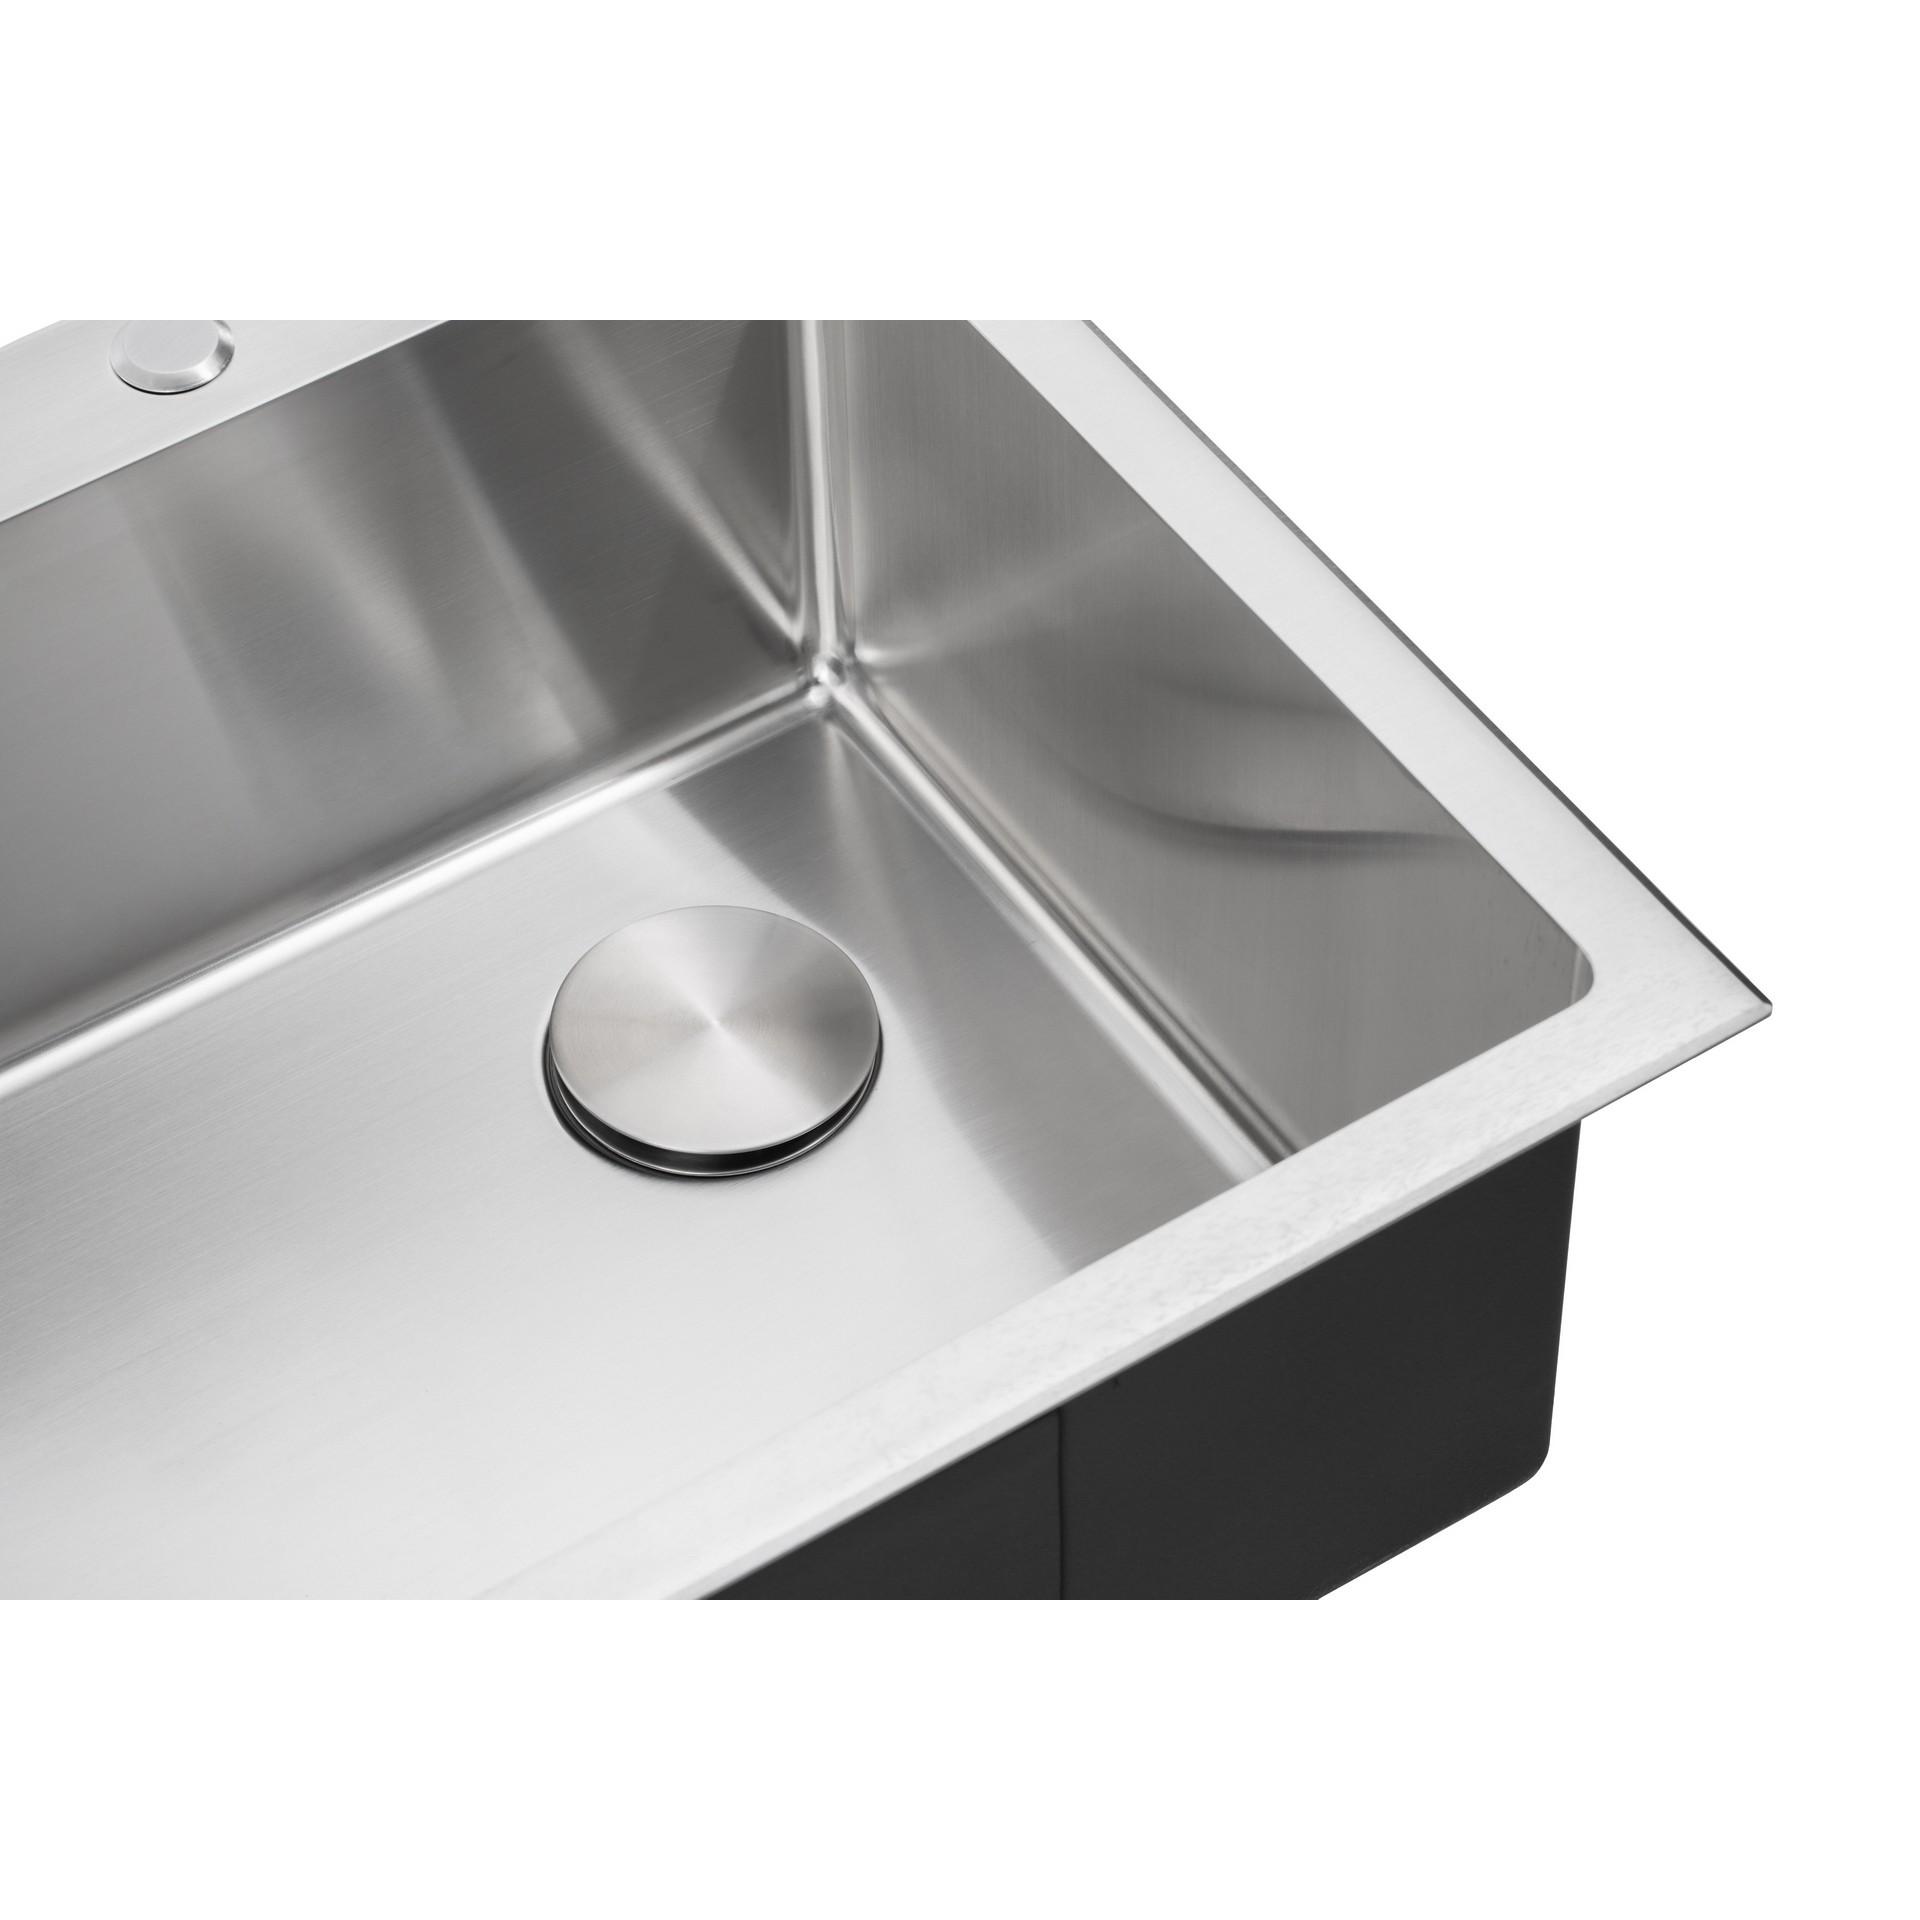 ariel lyrids 33 inch topmount drop in stainless steel sink offset drain opening true 16 gauge bowl w 9 gauge deck includes bottom protective